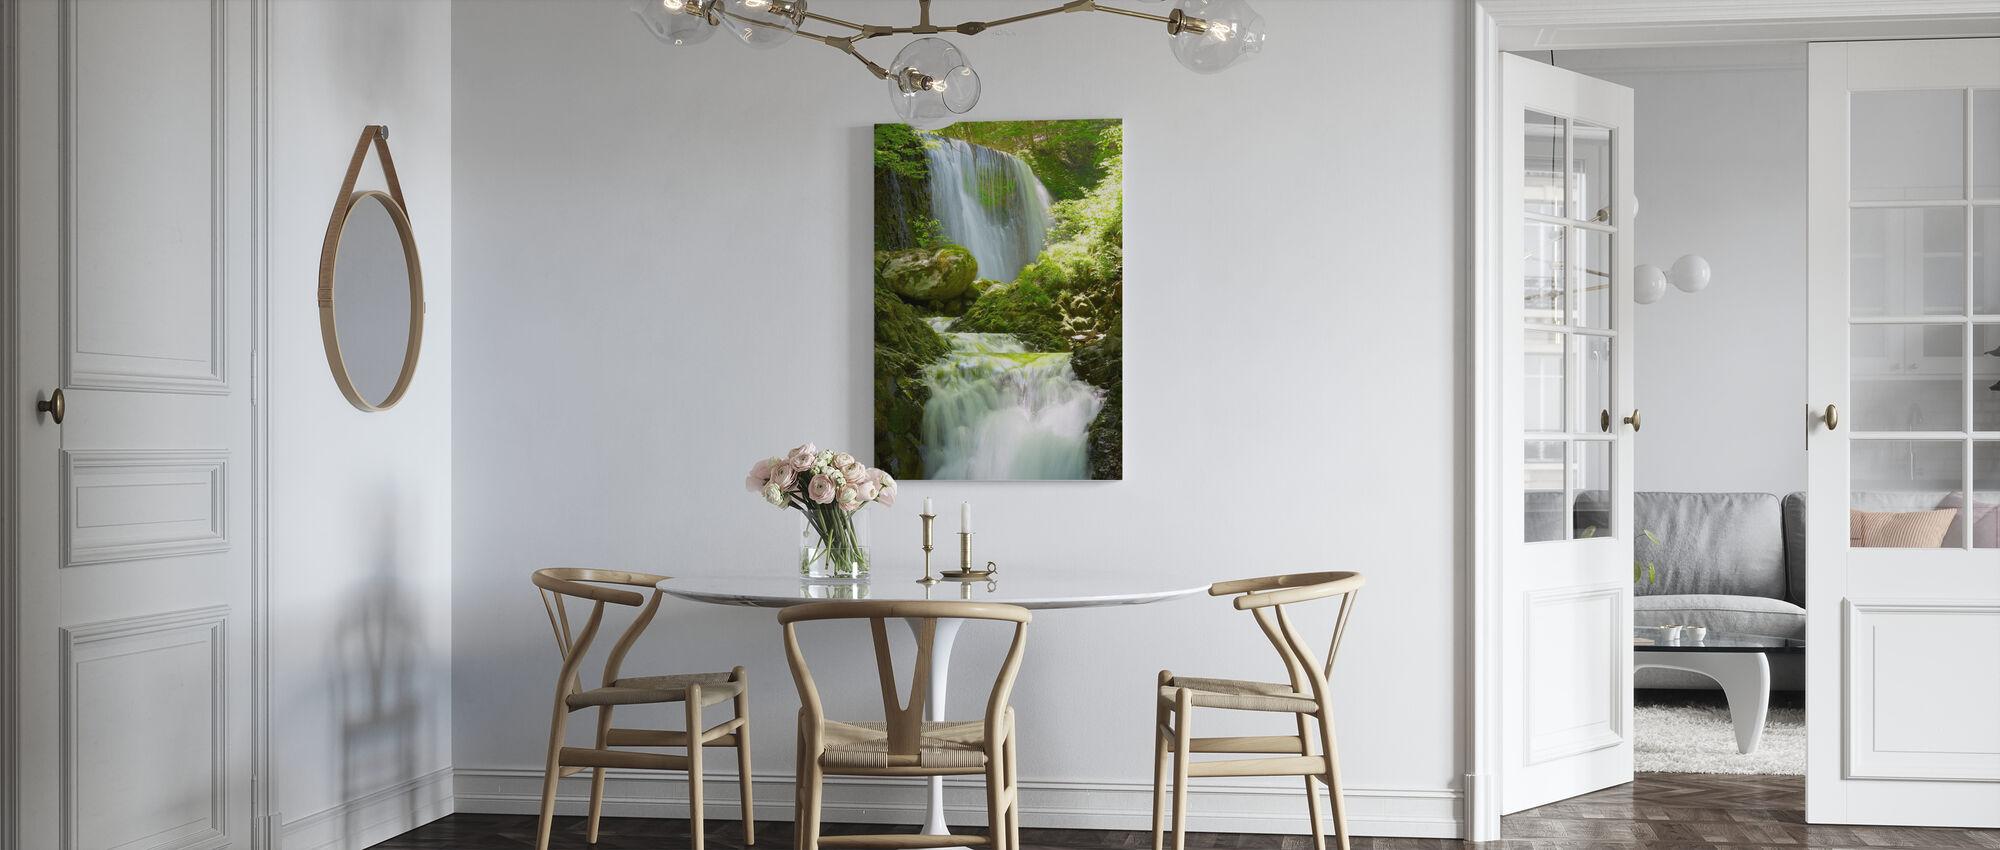 Koromonotaki Falls - Canvastavla - Kök